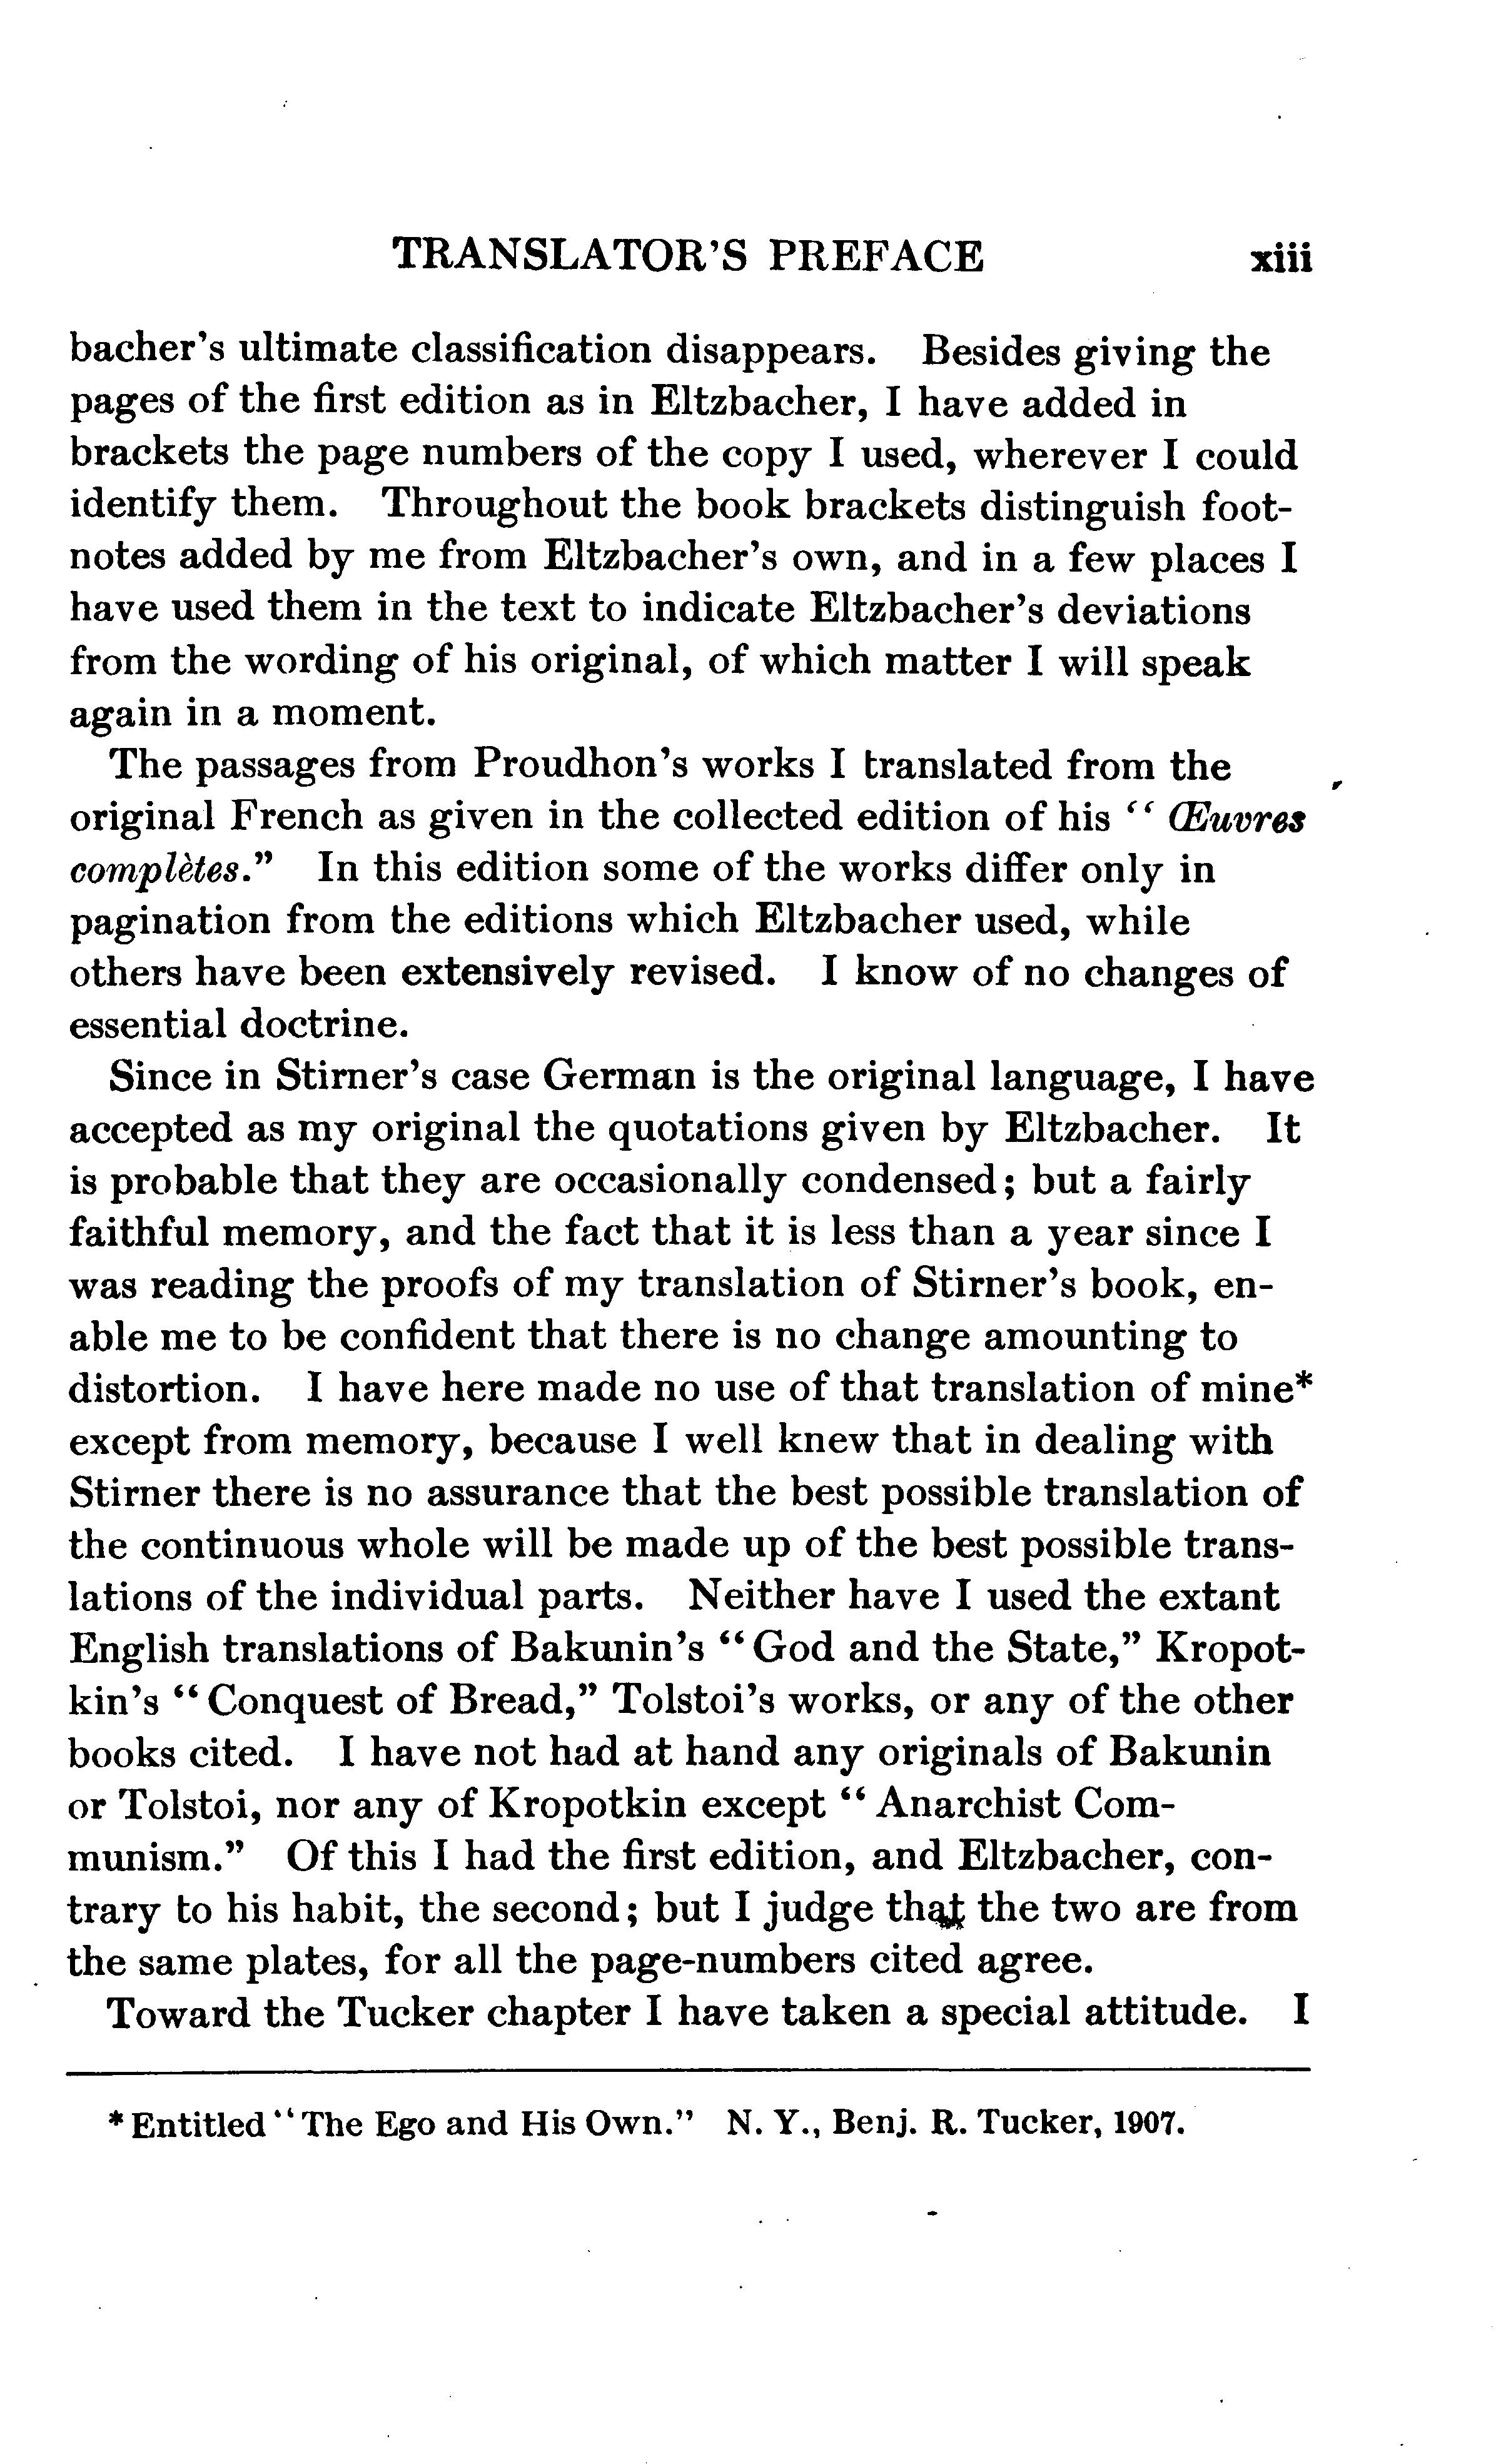 the book thief summary part 4